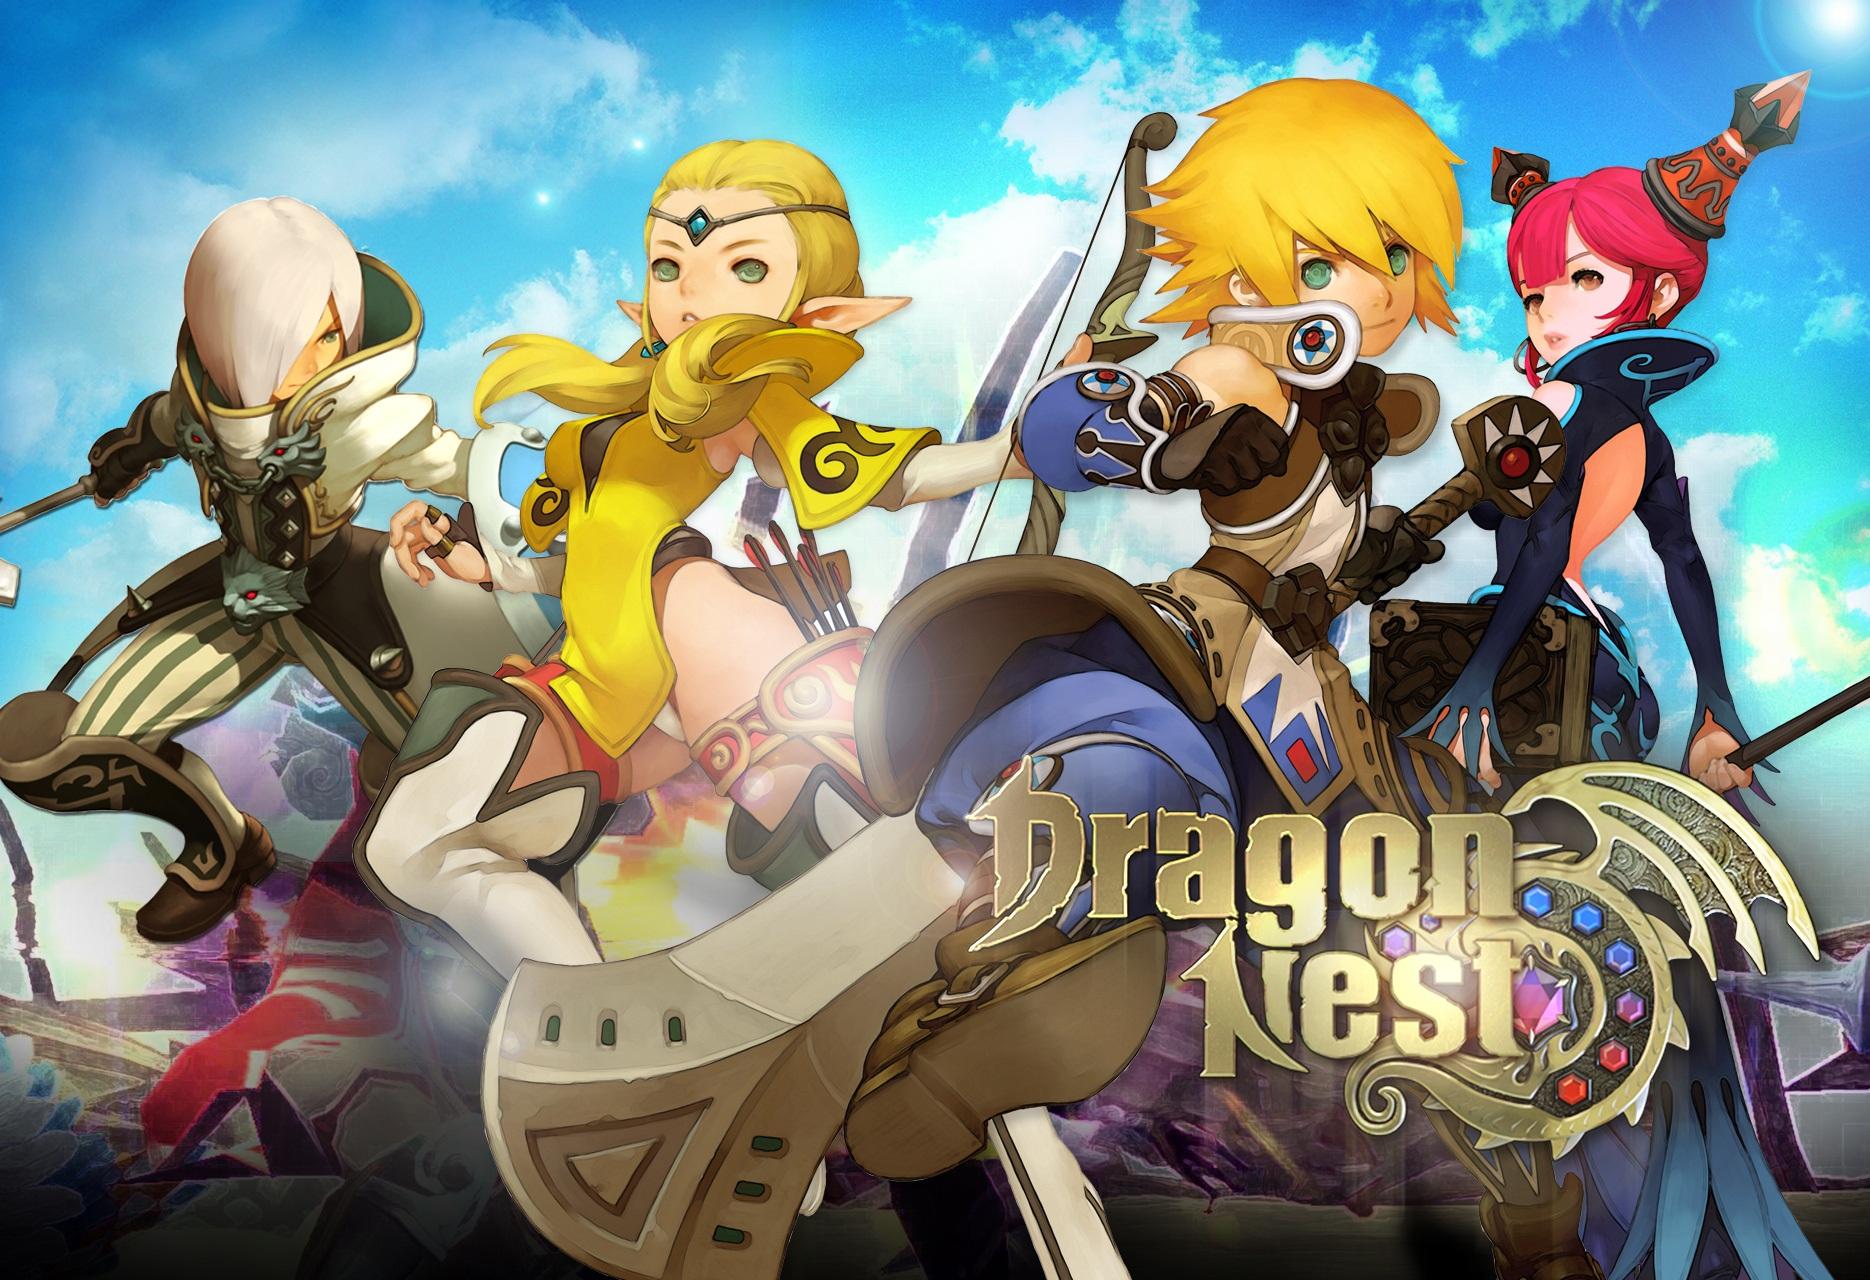 Dragonest